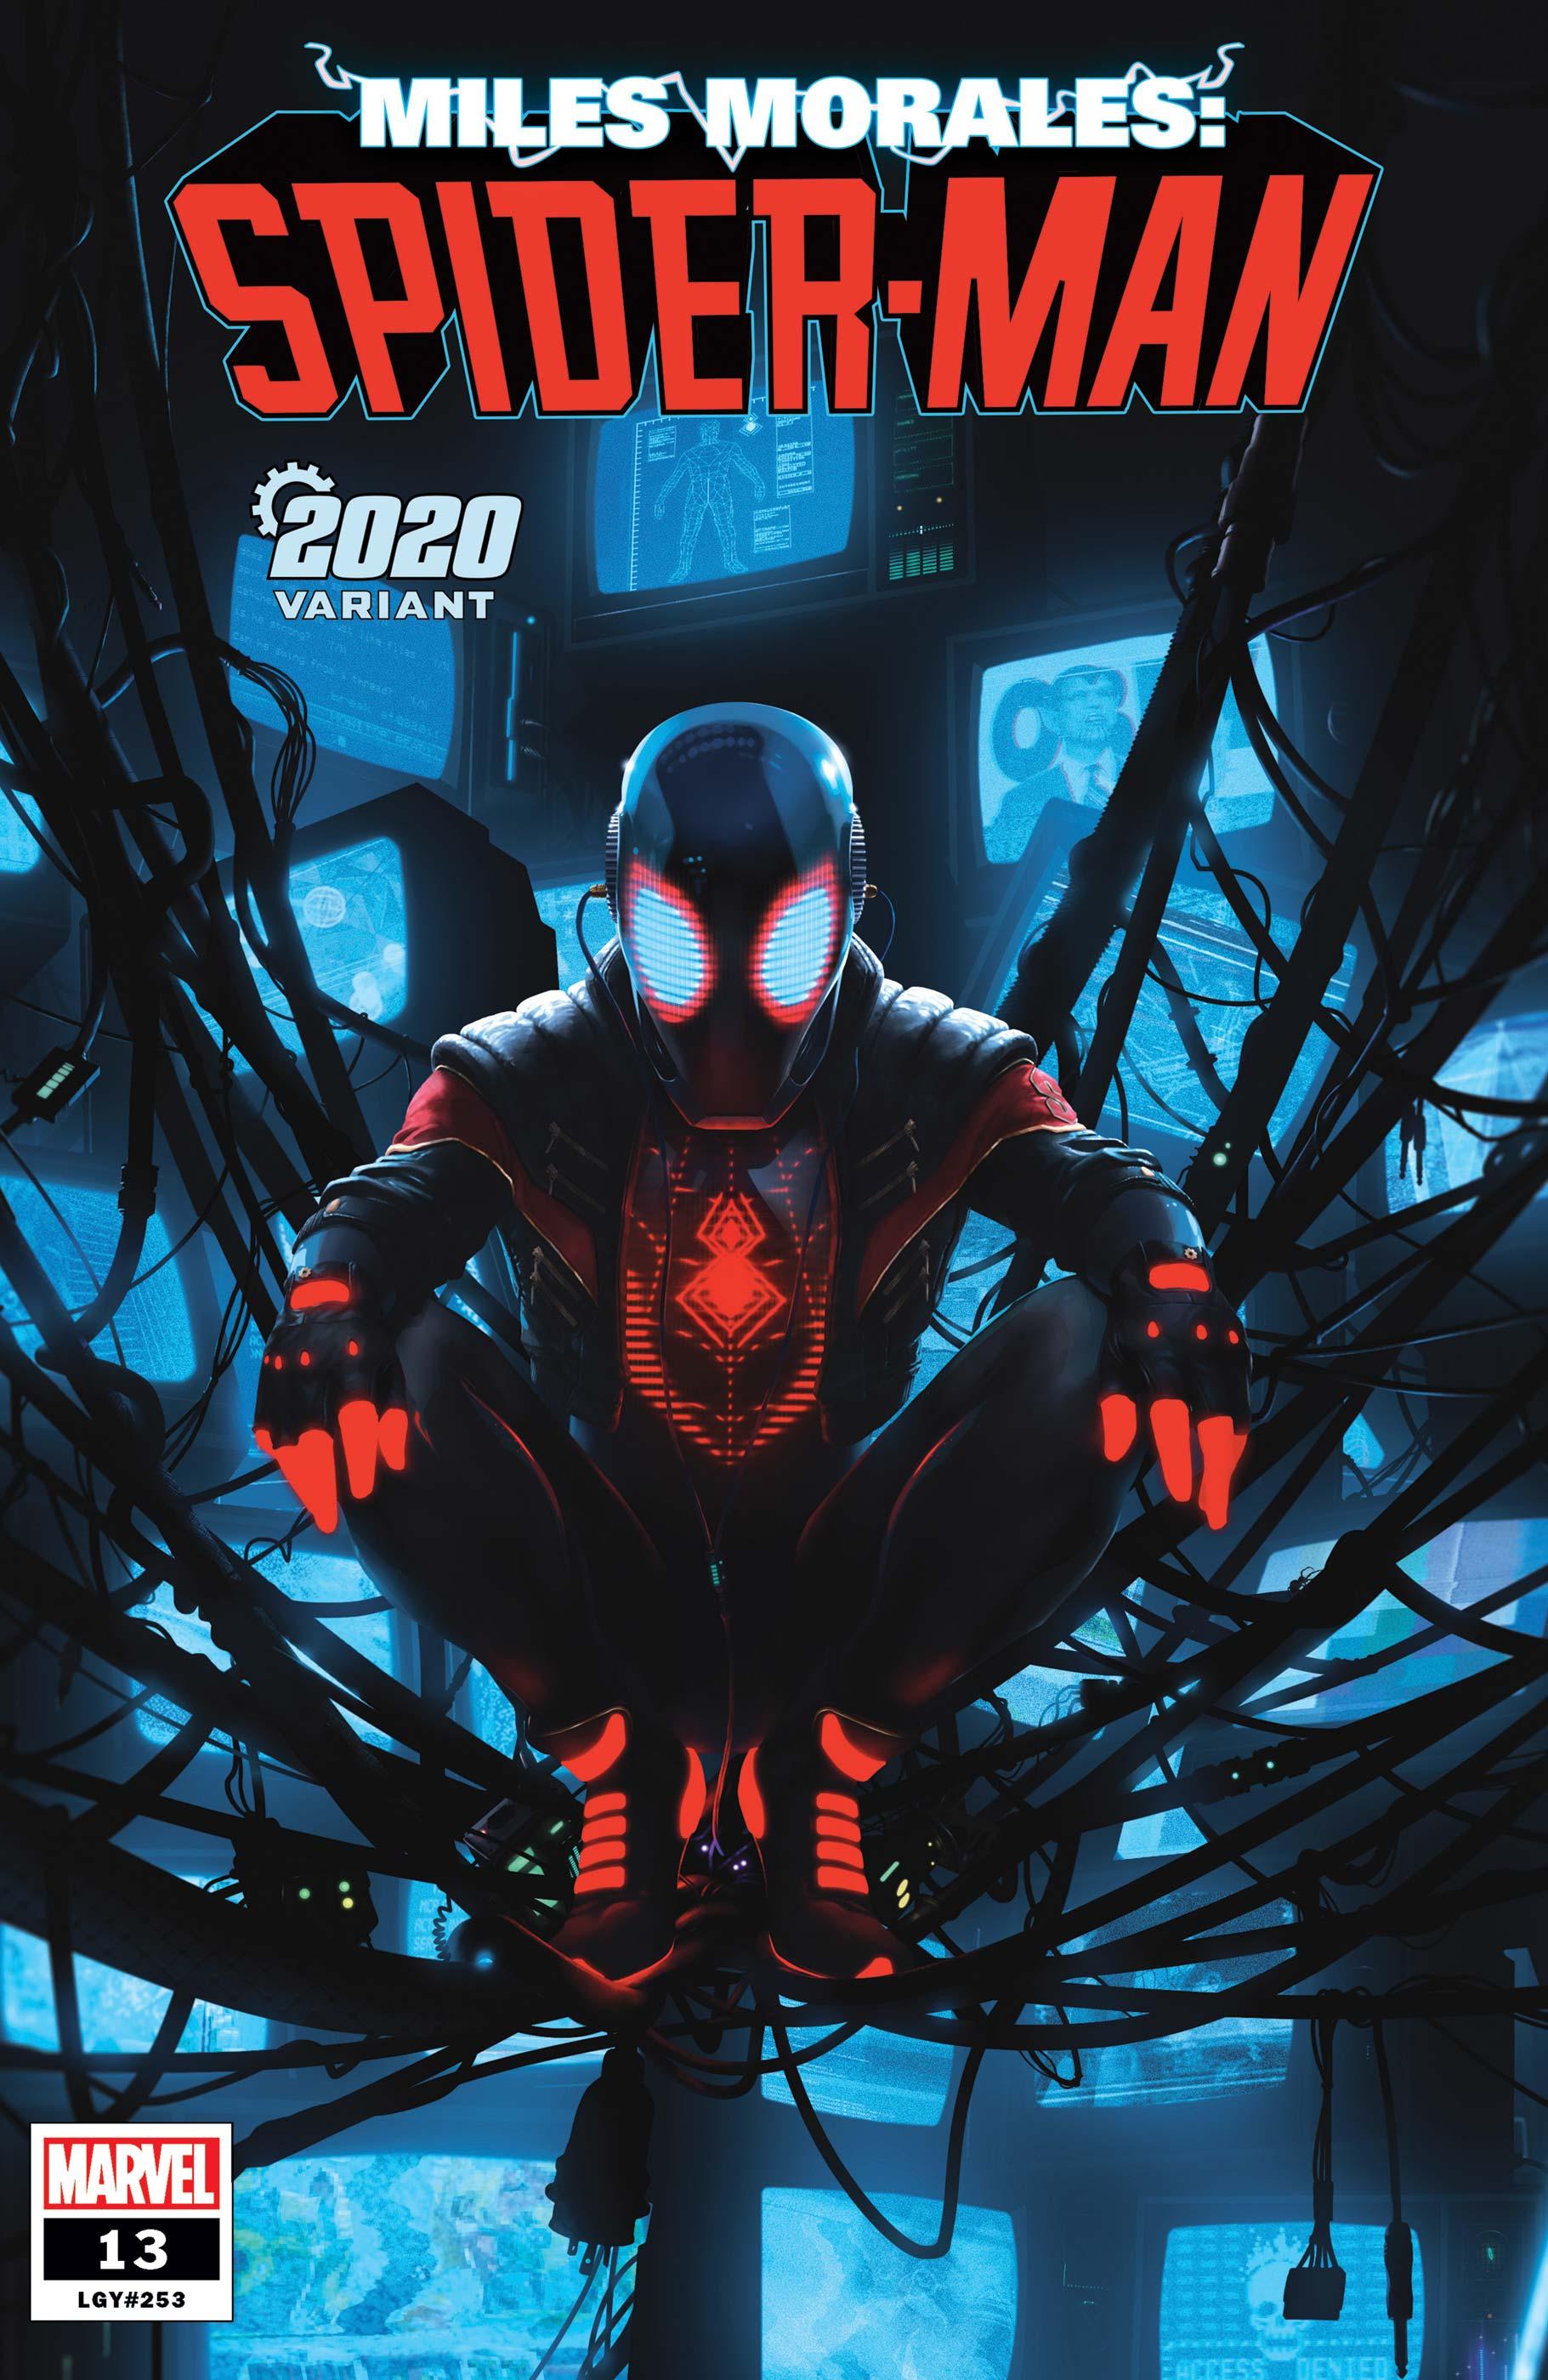 Miles Morales Spider-Man Vol 1 13 2020 Variant.jpg